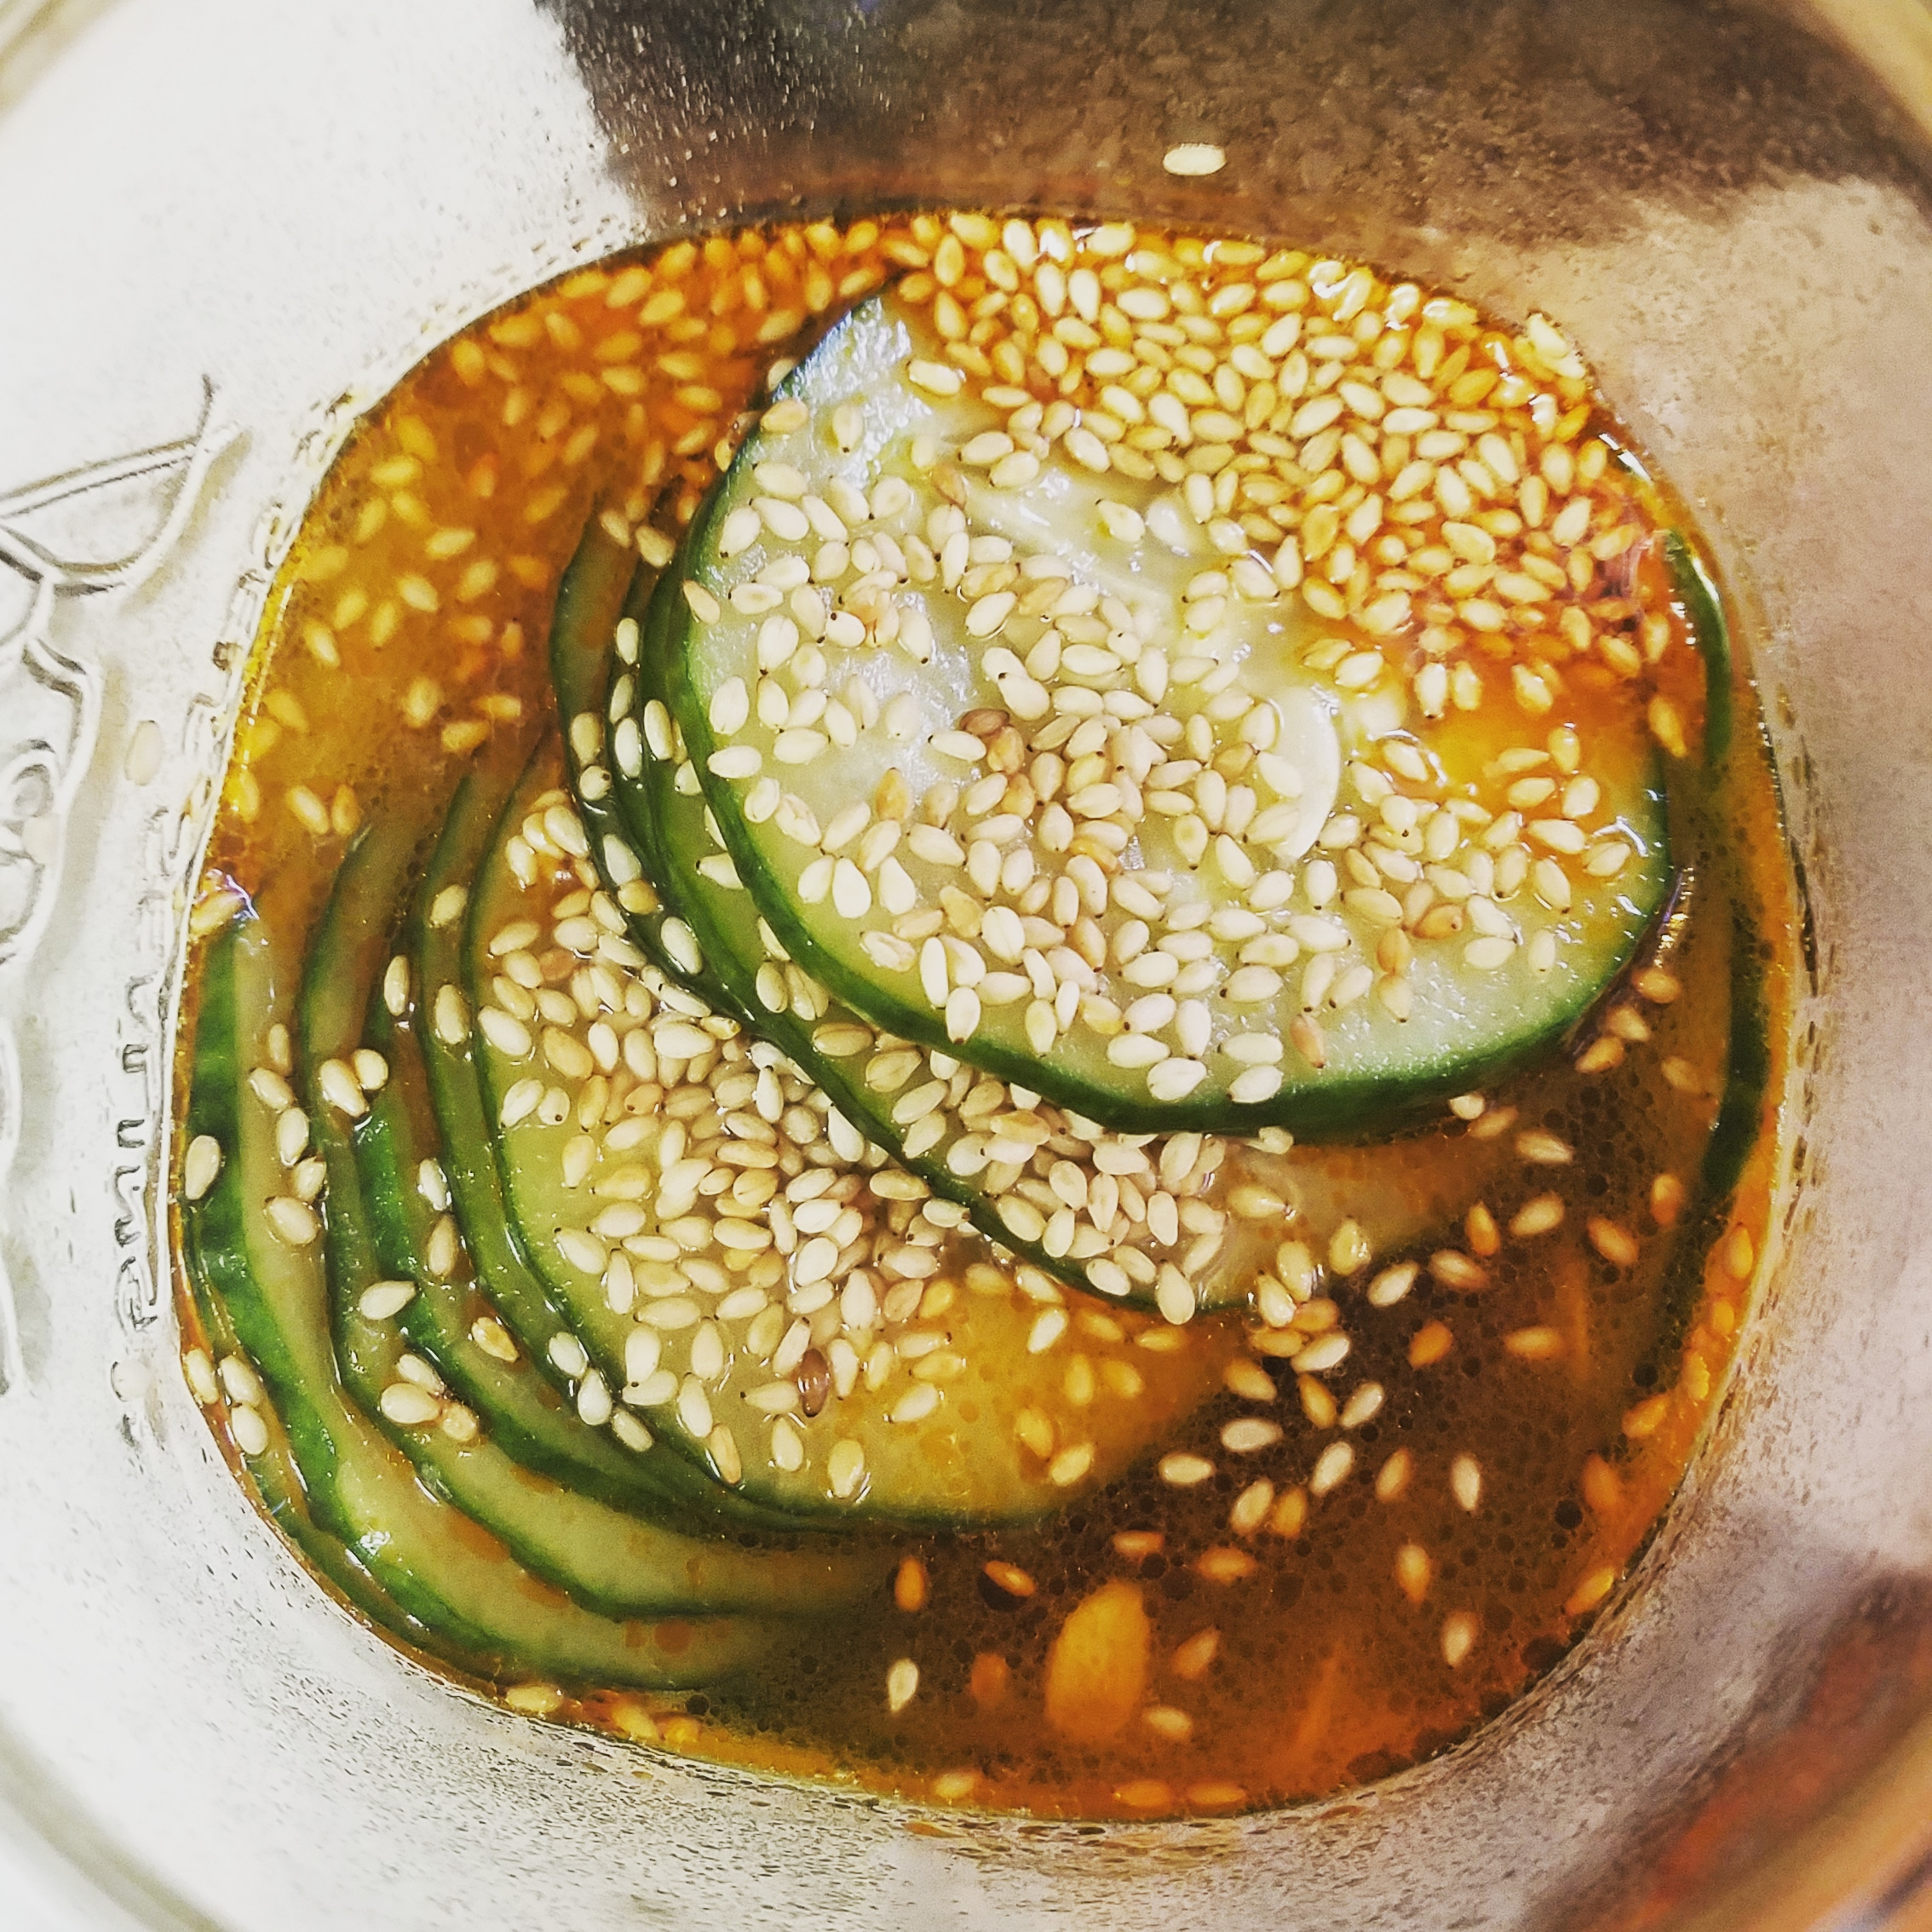 Japanese-Style Pickled Cucumber (Sunomono) Teresa Beach-Koecher